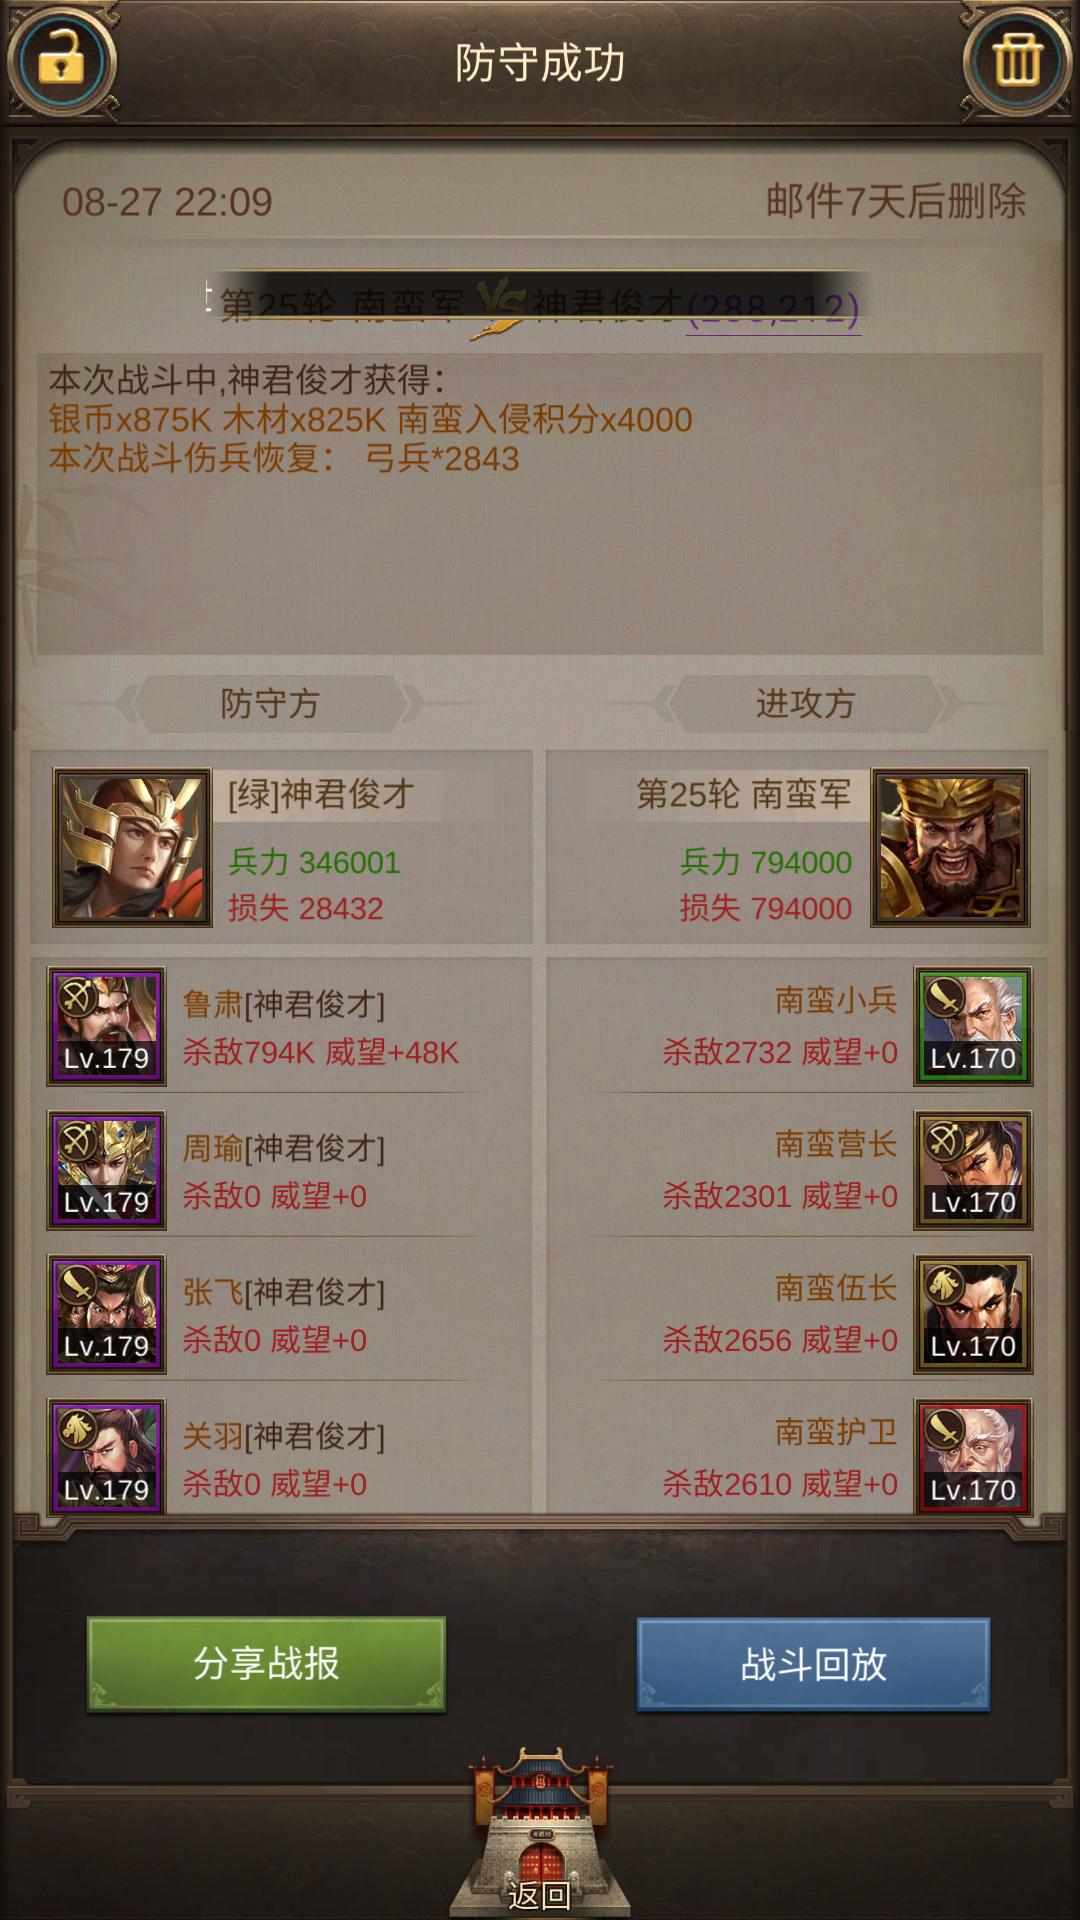 Screenshot_20200827-220911.png